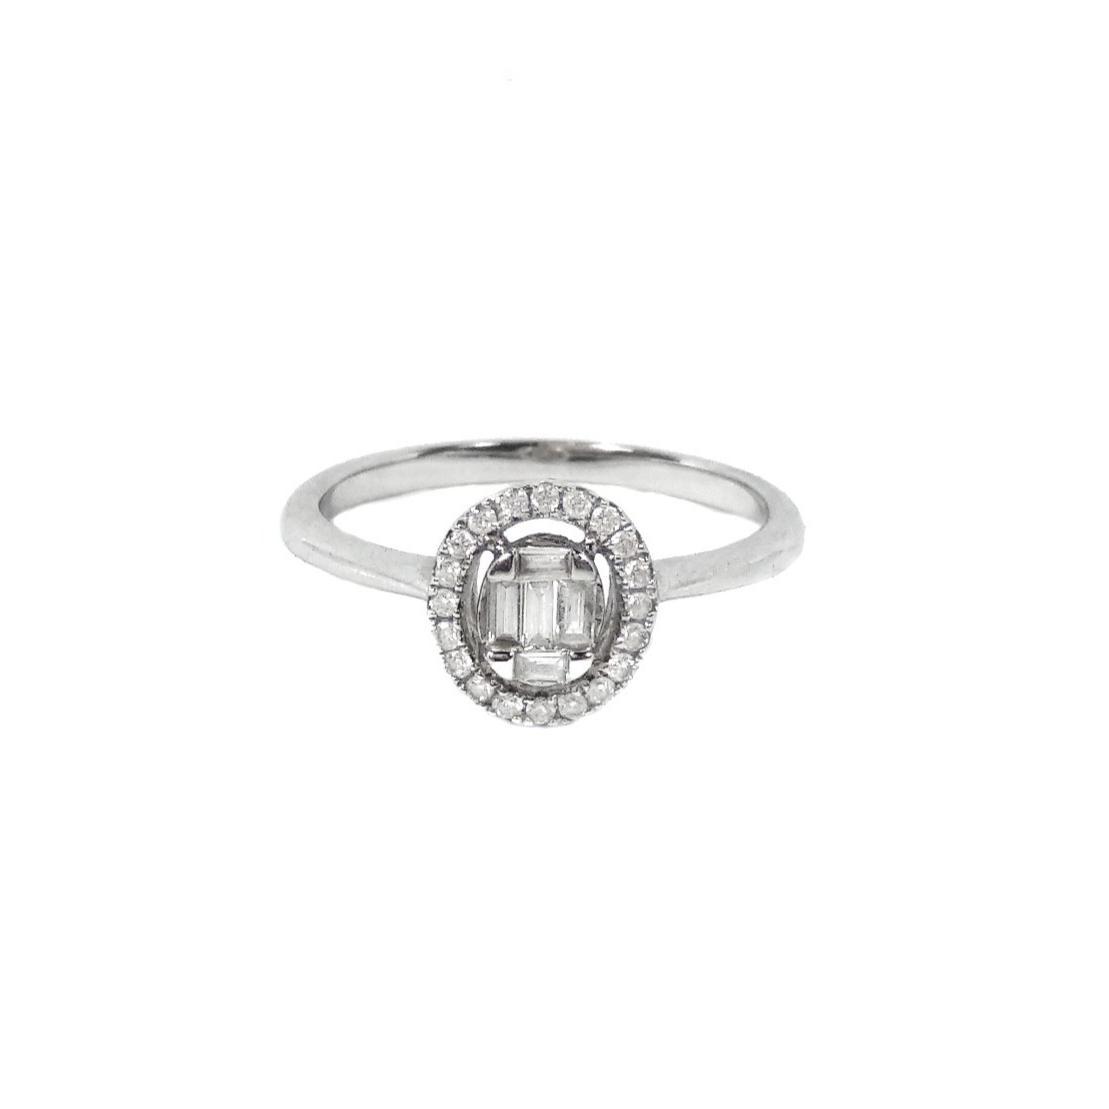 Anel Oval Diamantes Baguetes e Brilhantes Ouro branco 18k